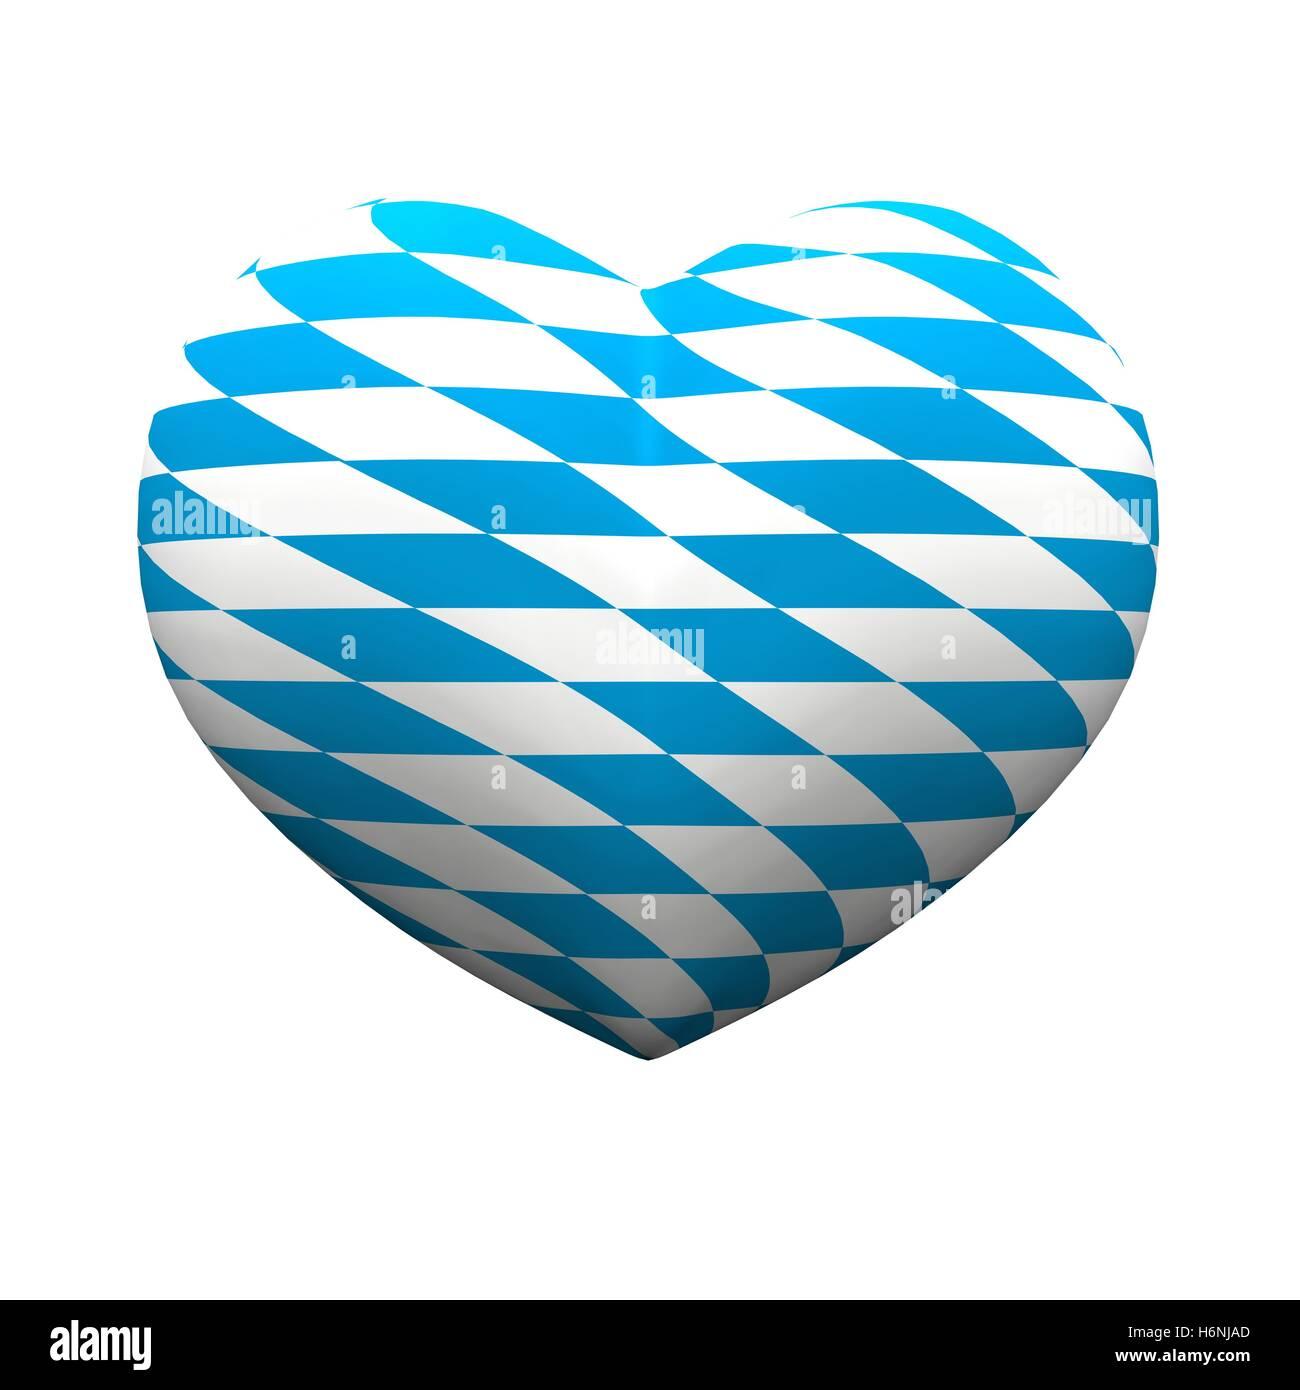 3d heart - we love bavaria 02 - Stock Image